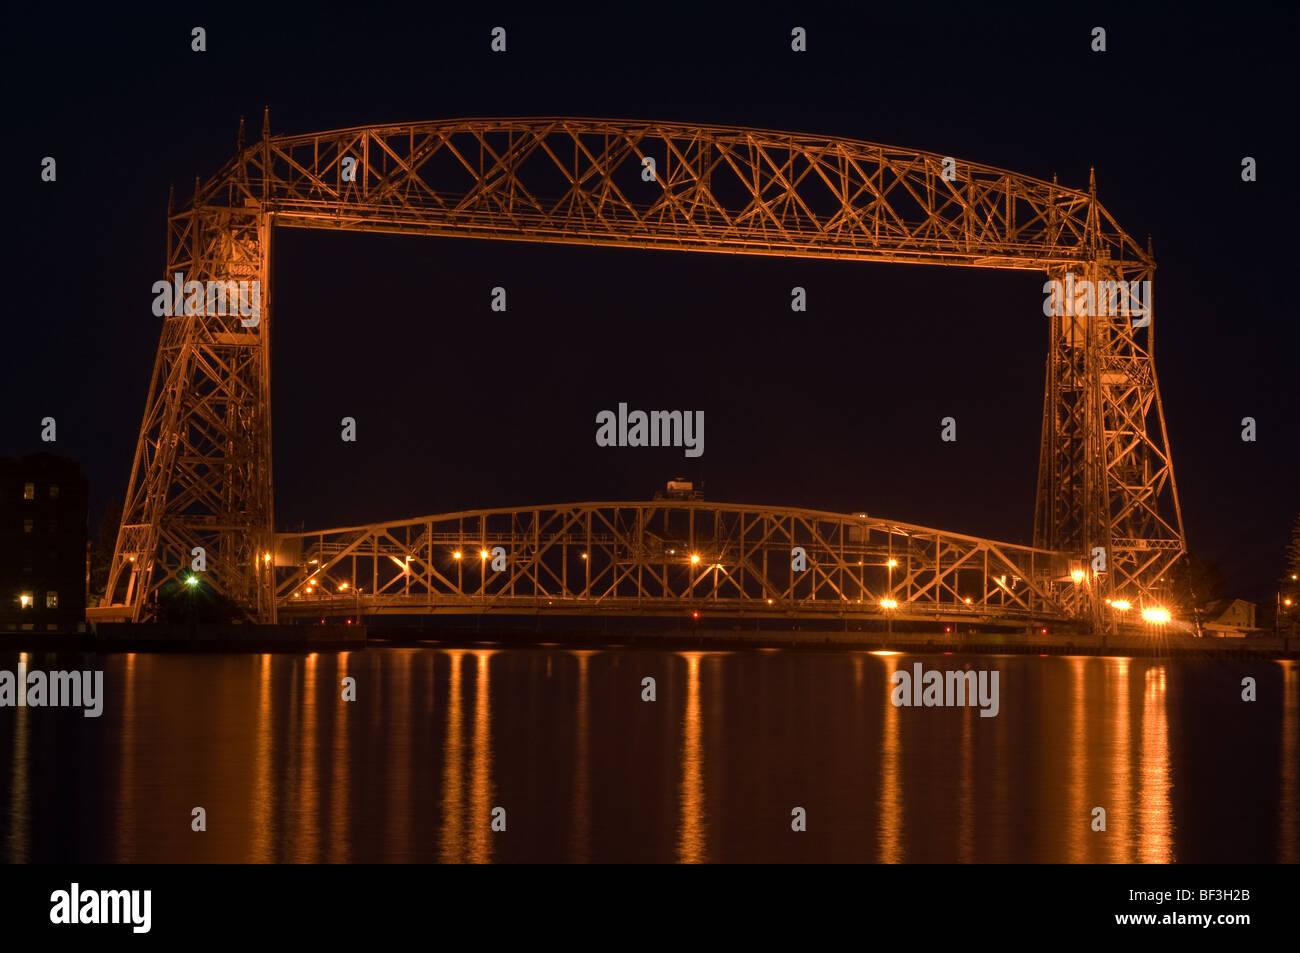 aerial lift bridge in Duluth on Lake superior at night - Stock Image